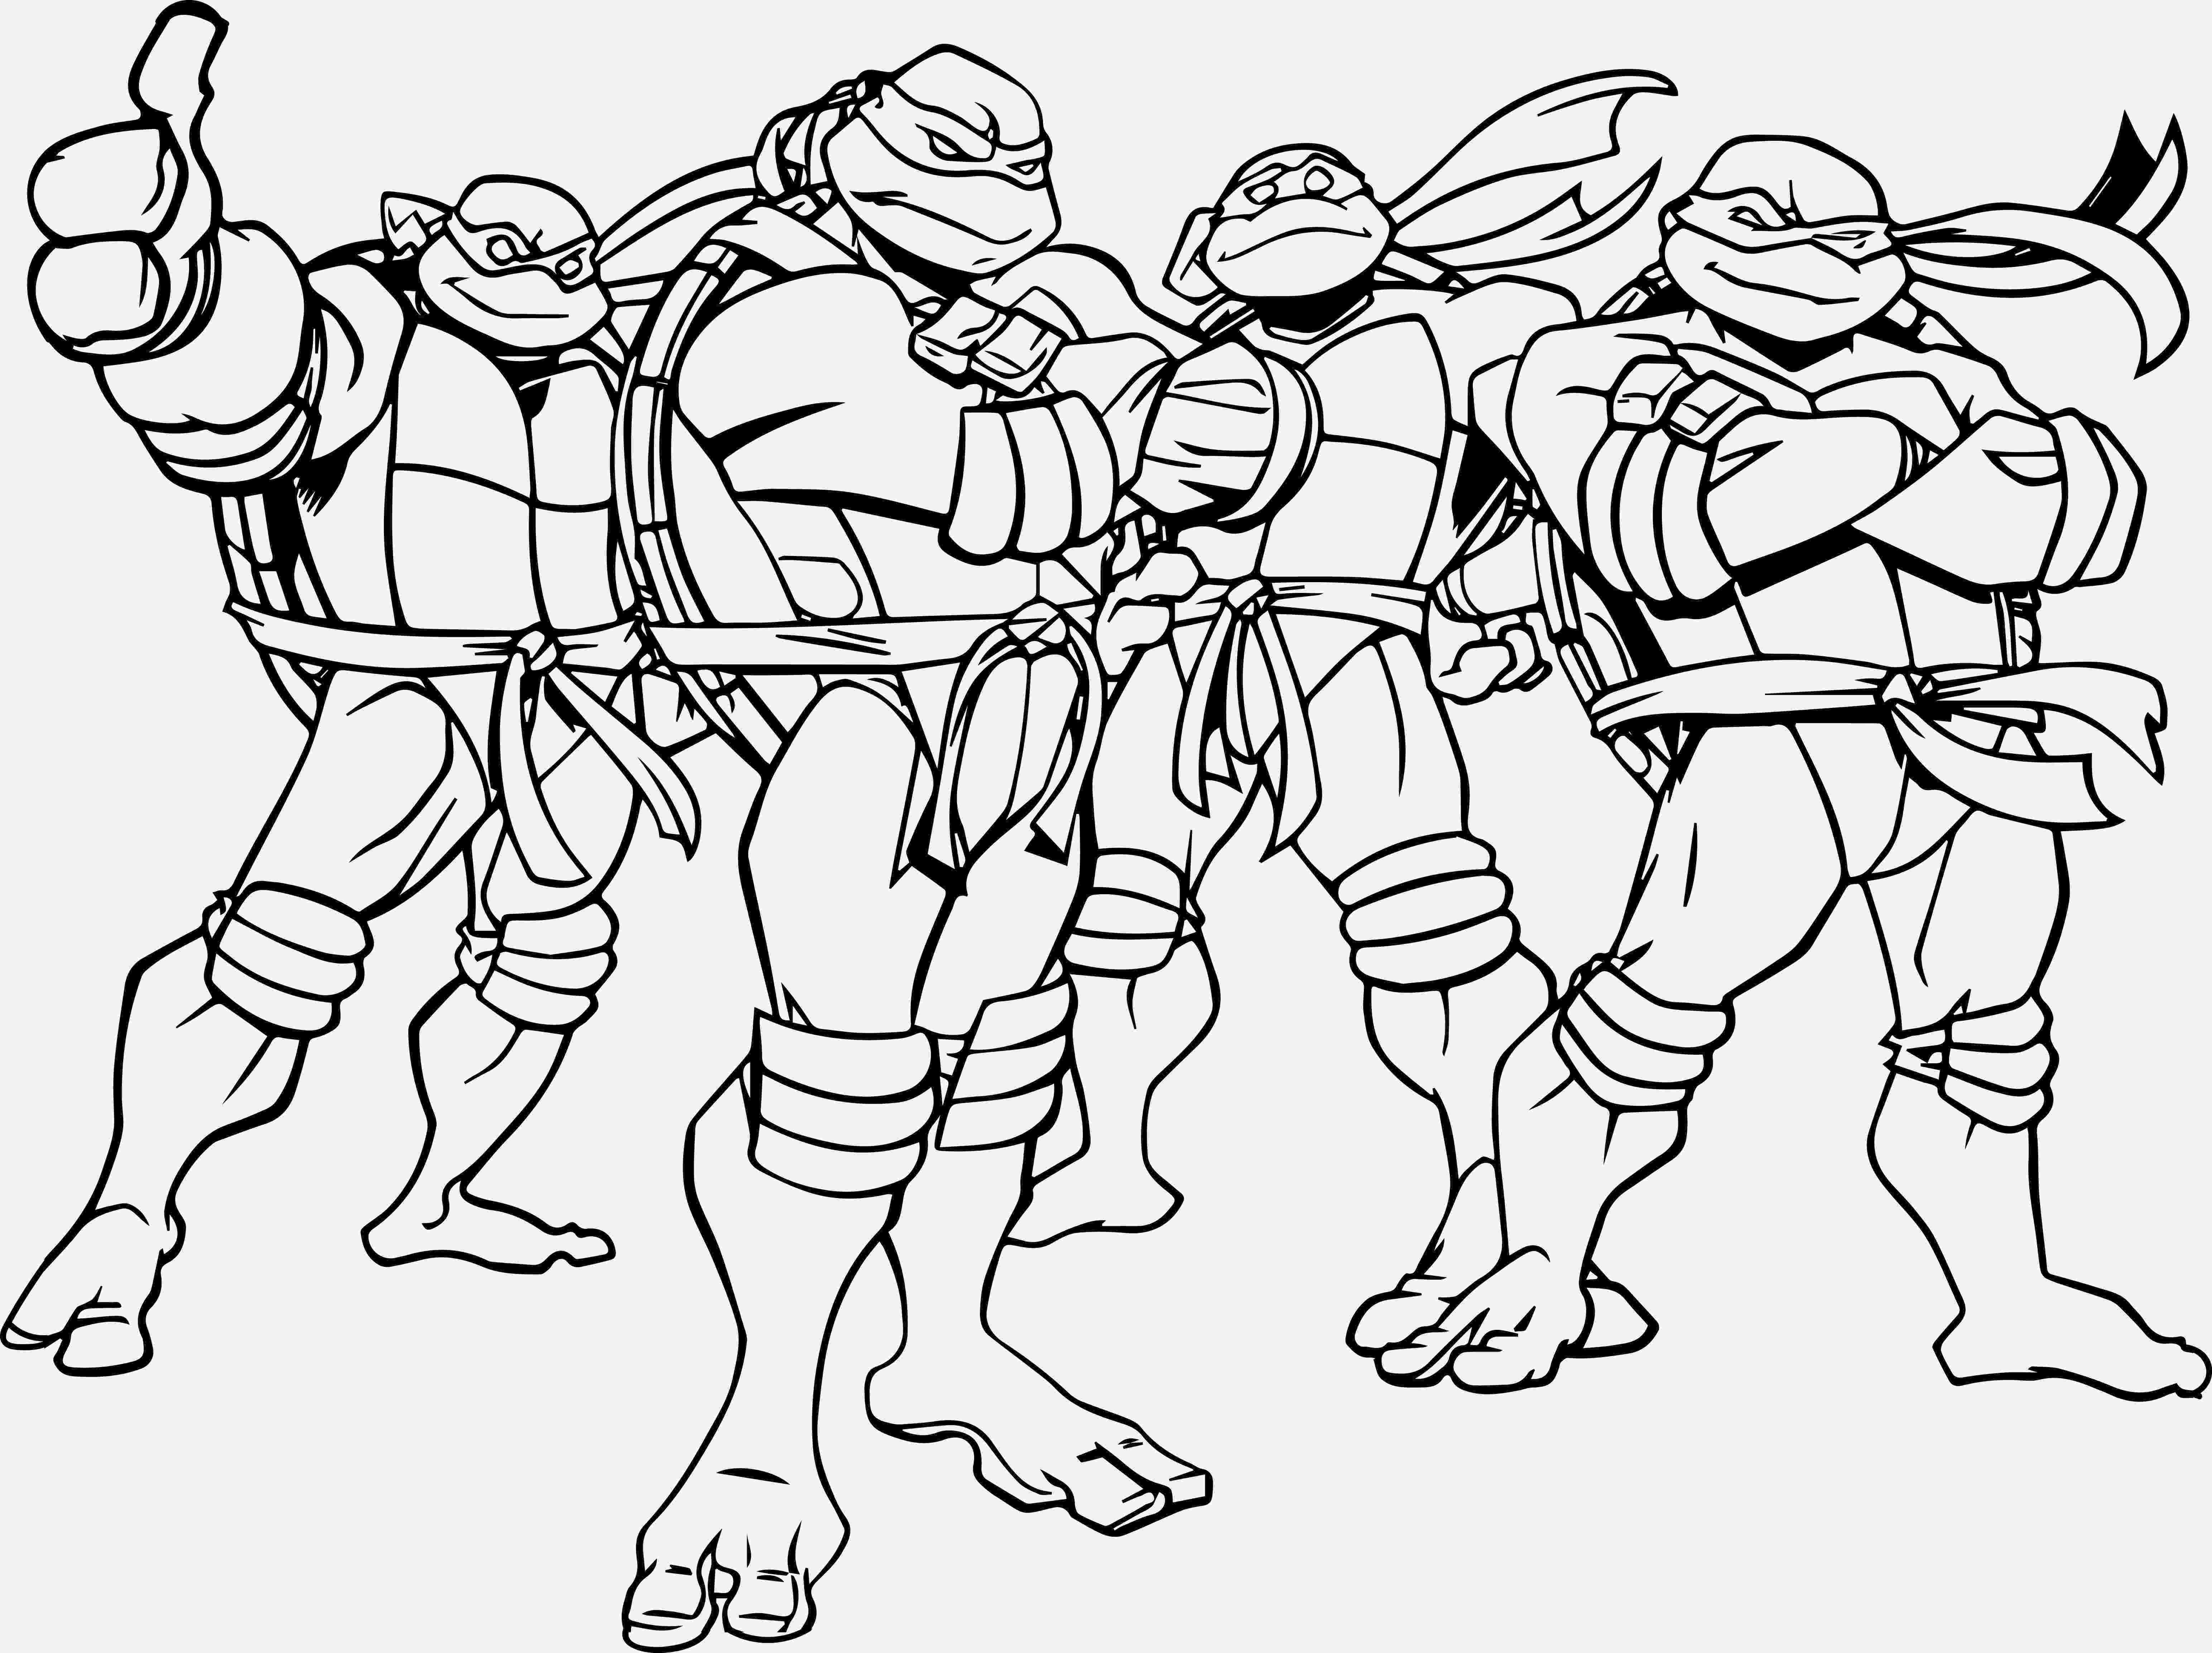 teenage mutant ninja turtles coloring pages coloring pages teenage mutant ninja turtles tmnt page pages coloring teenage mutant turtles ninja